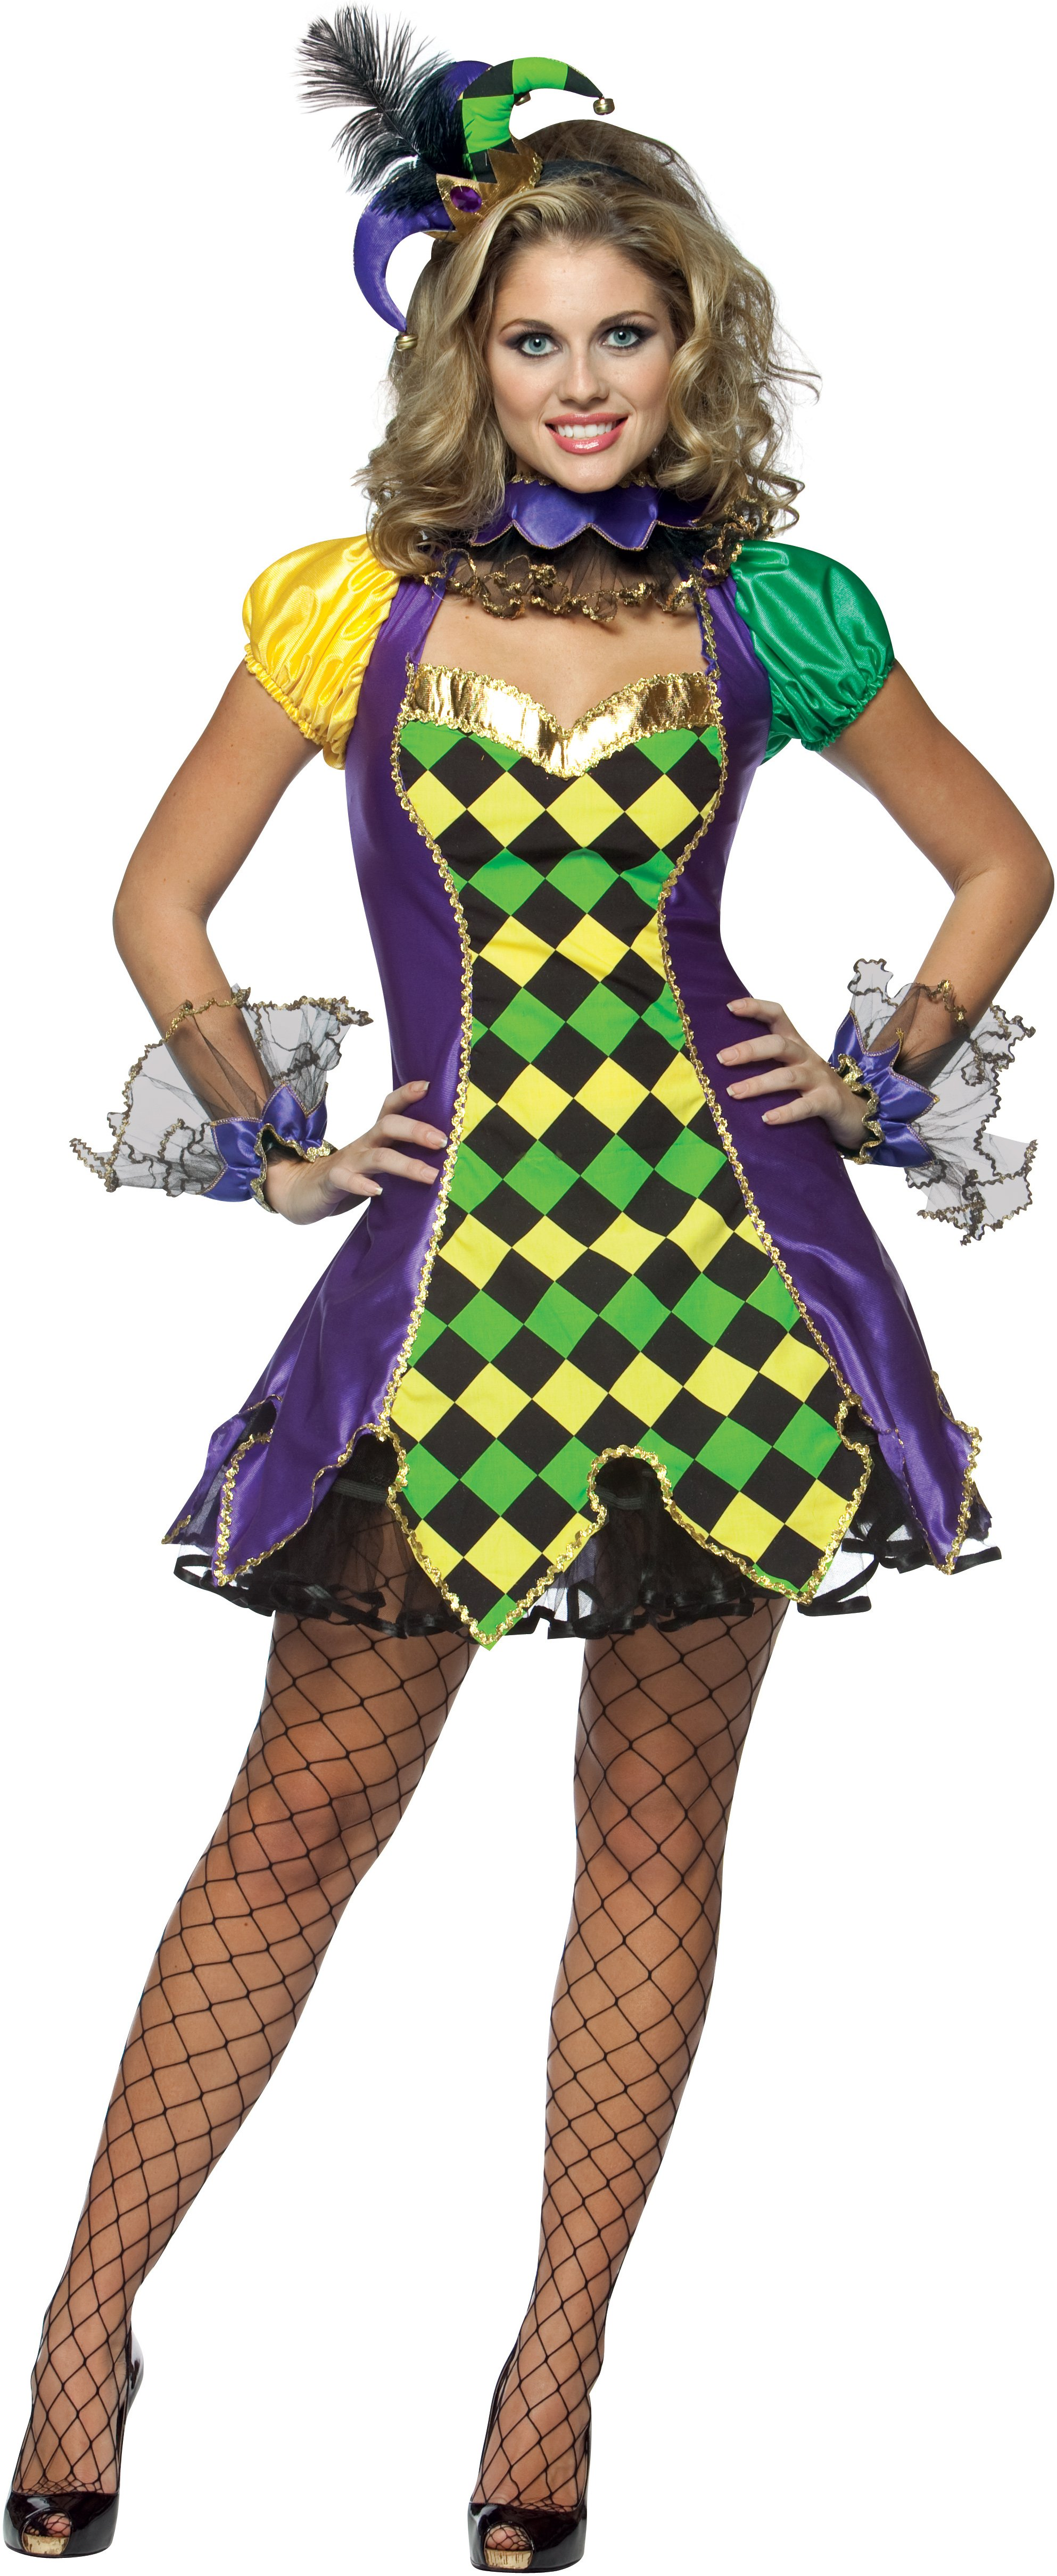 C987 Harley Quinn Gotham Jokers Girls Villain Arkham City Batman Dress Costume | eBay